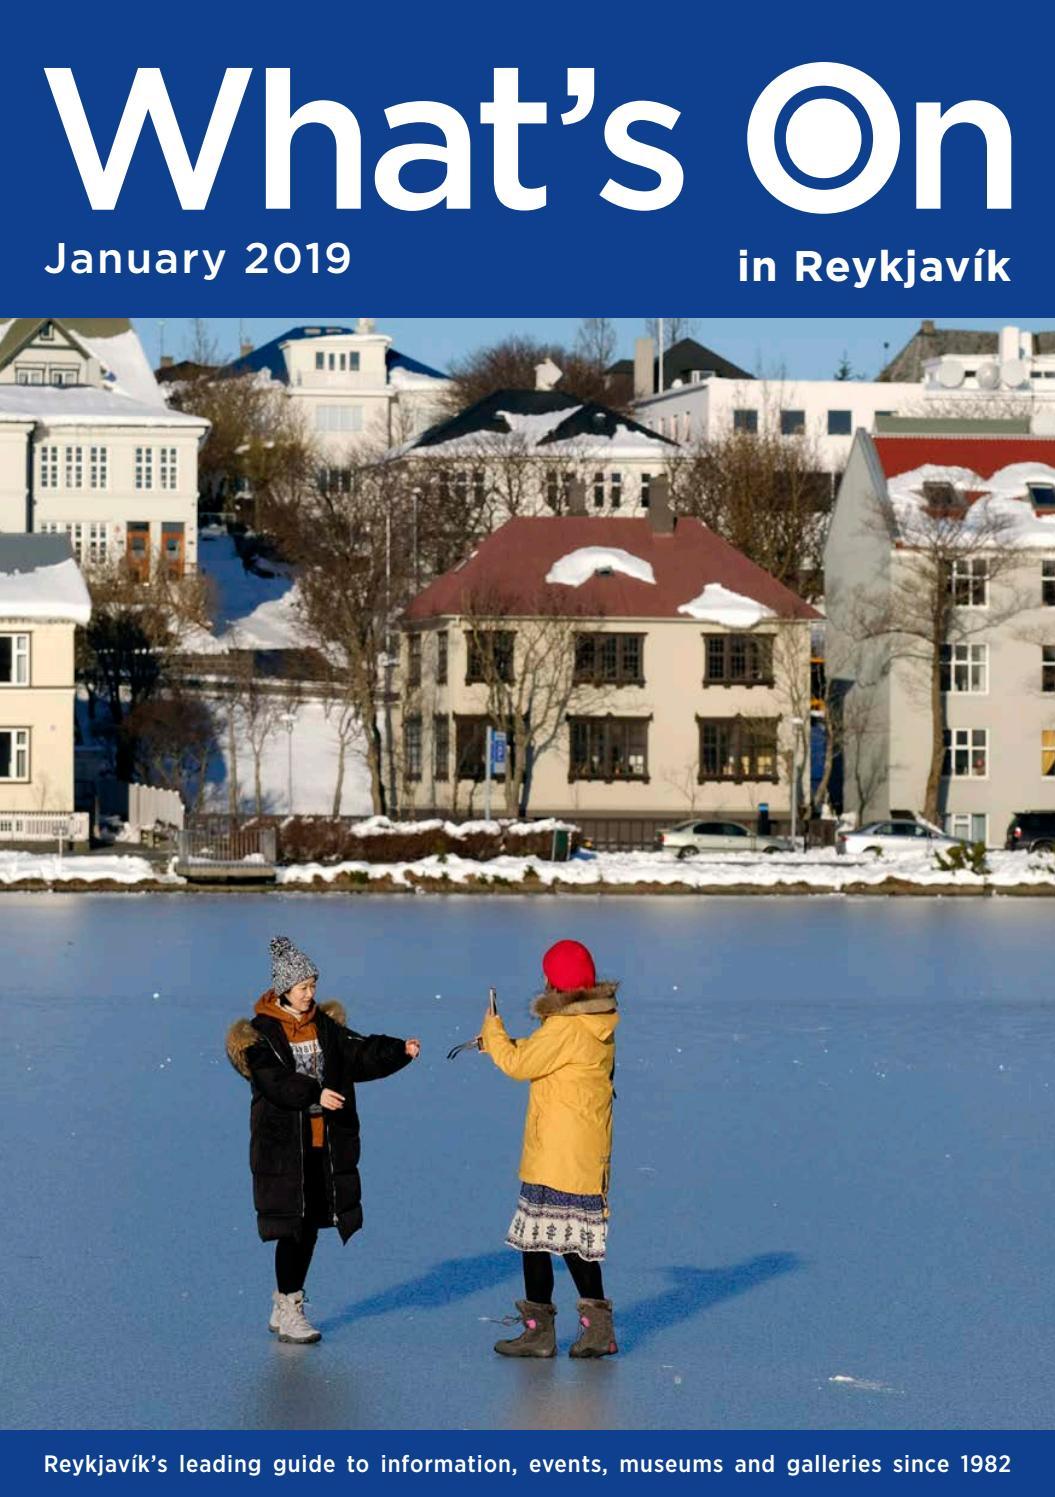 What's On in Reykjavík - January 2019 by MD Reykjavik - issuu